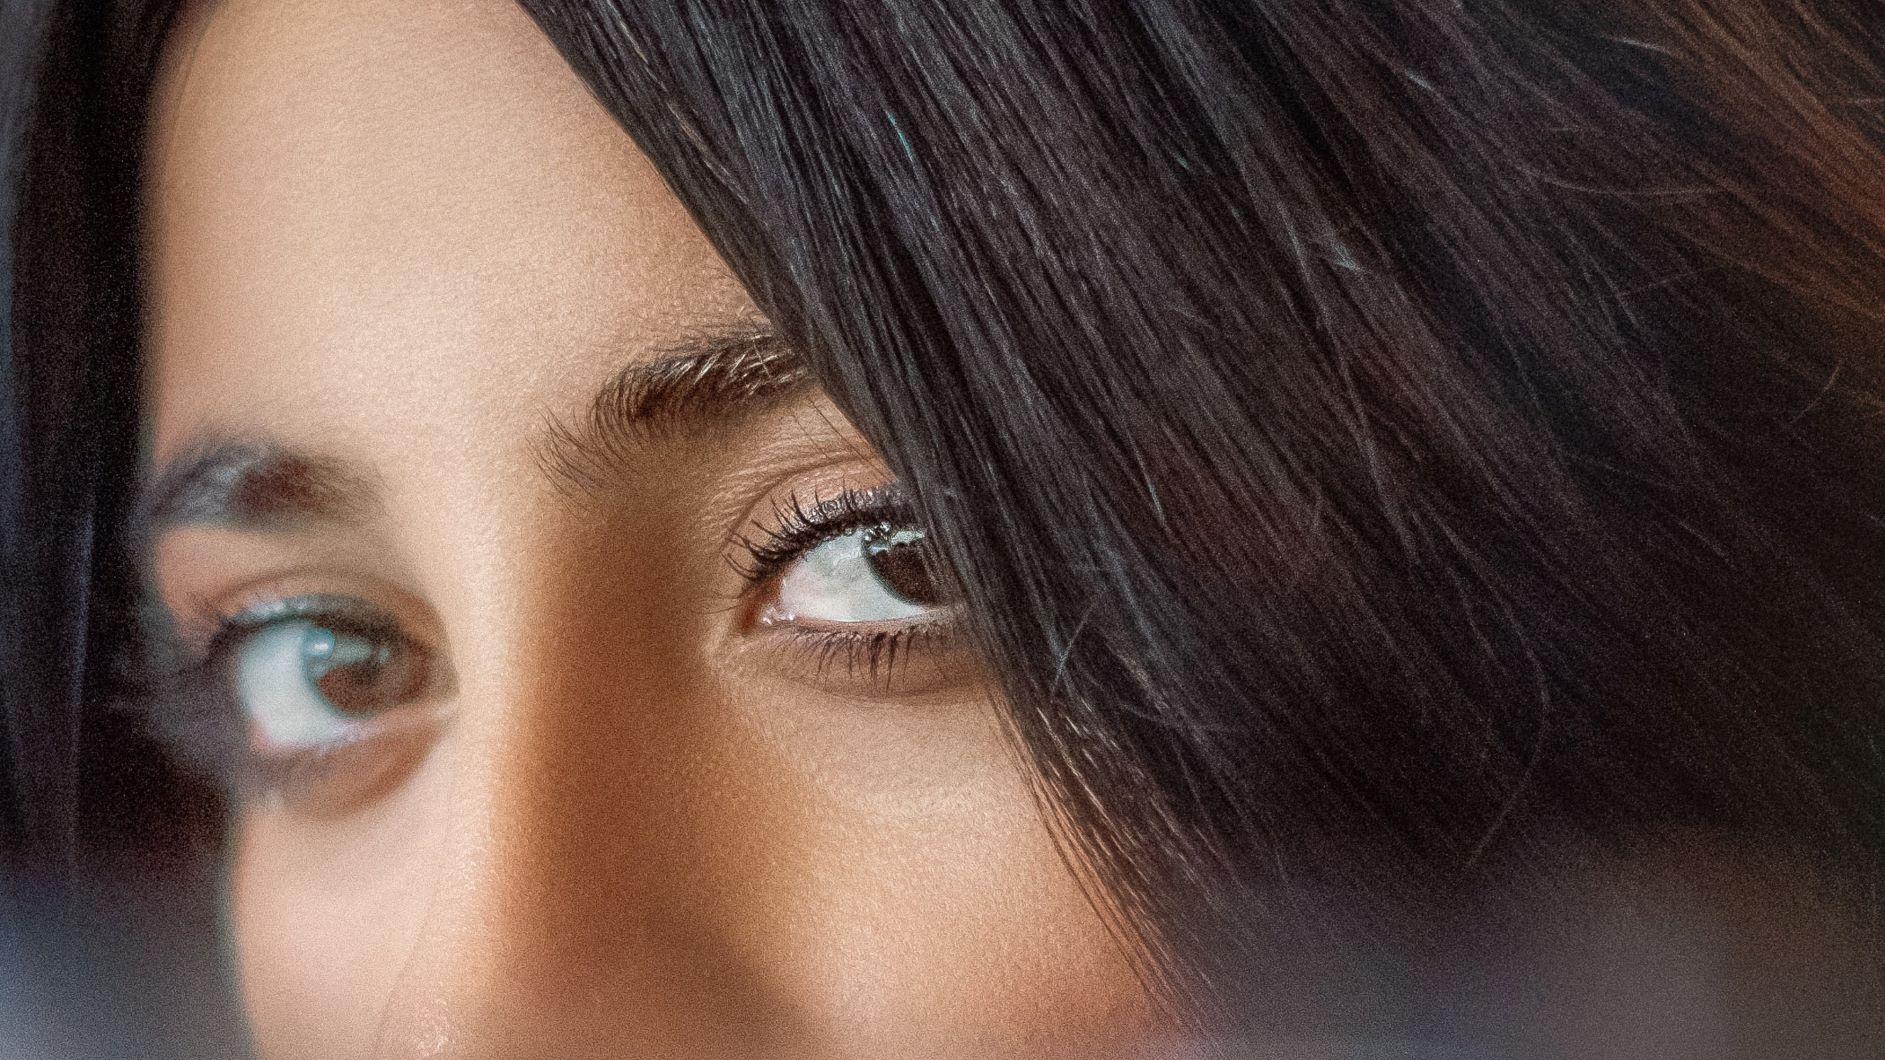 Woman looking through fringe